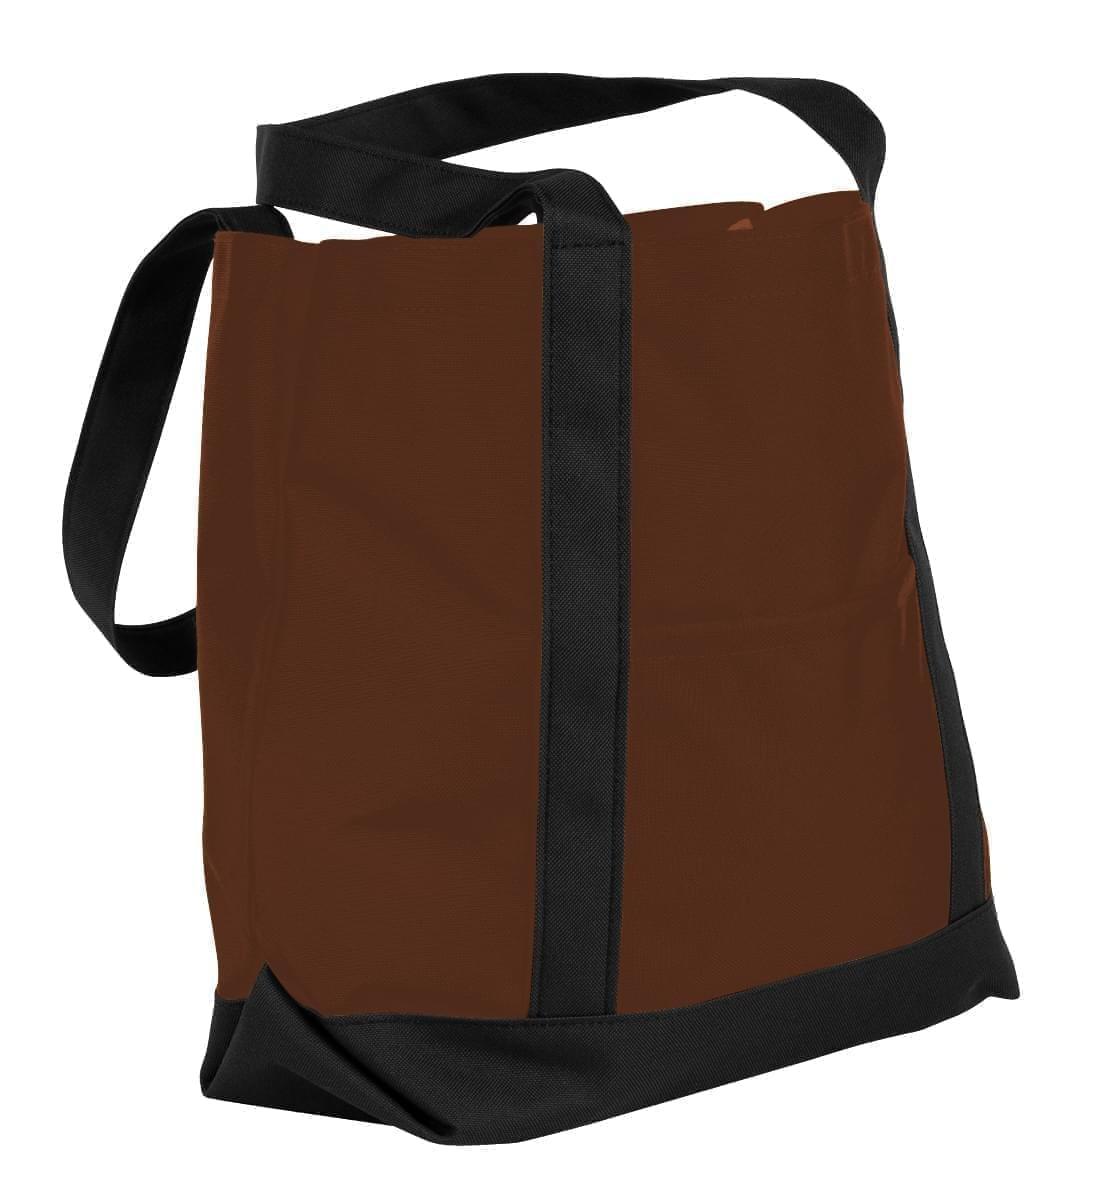 USA Made Nylon Poly Boat Tote Bags, Brown-Black, XAACL1UAPC